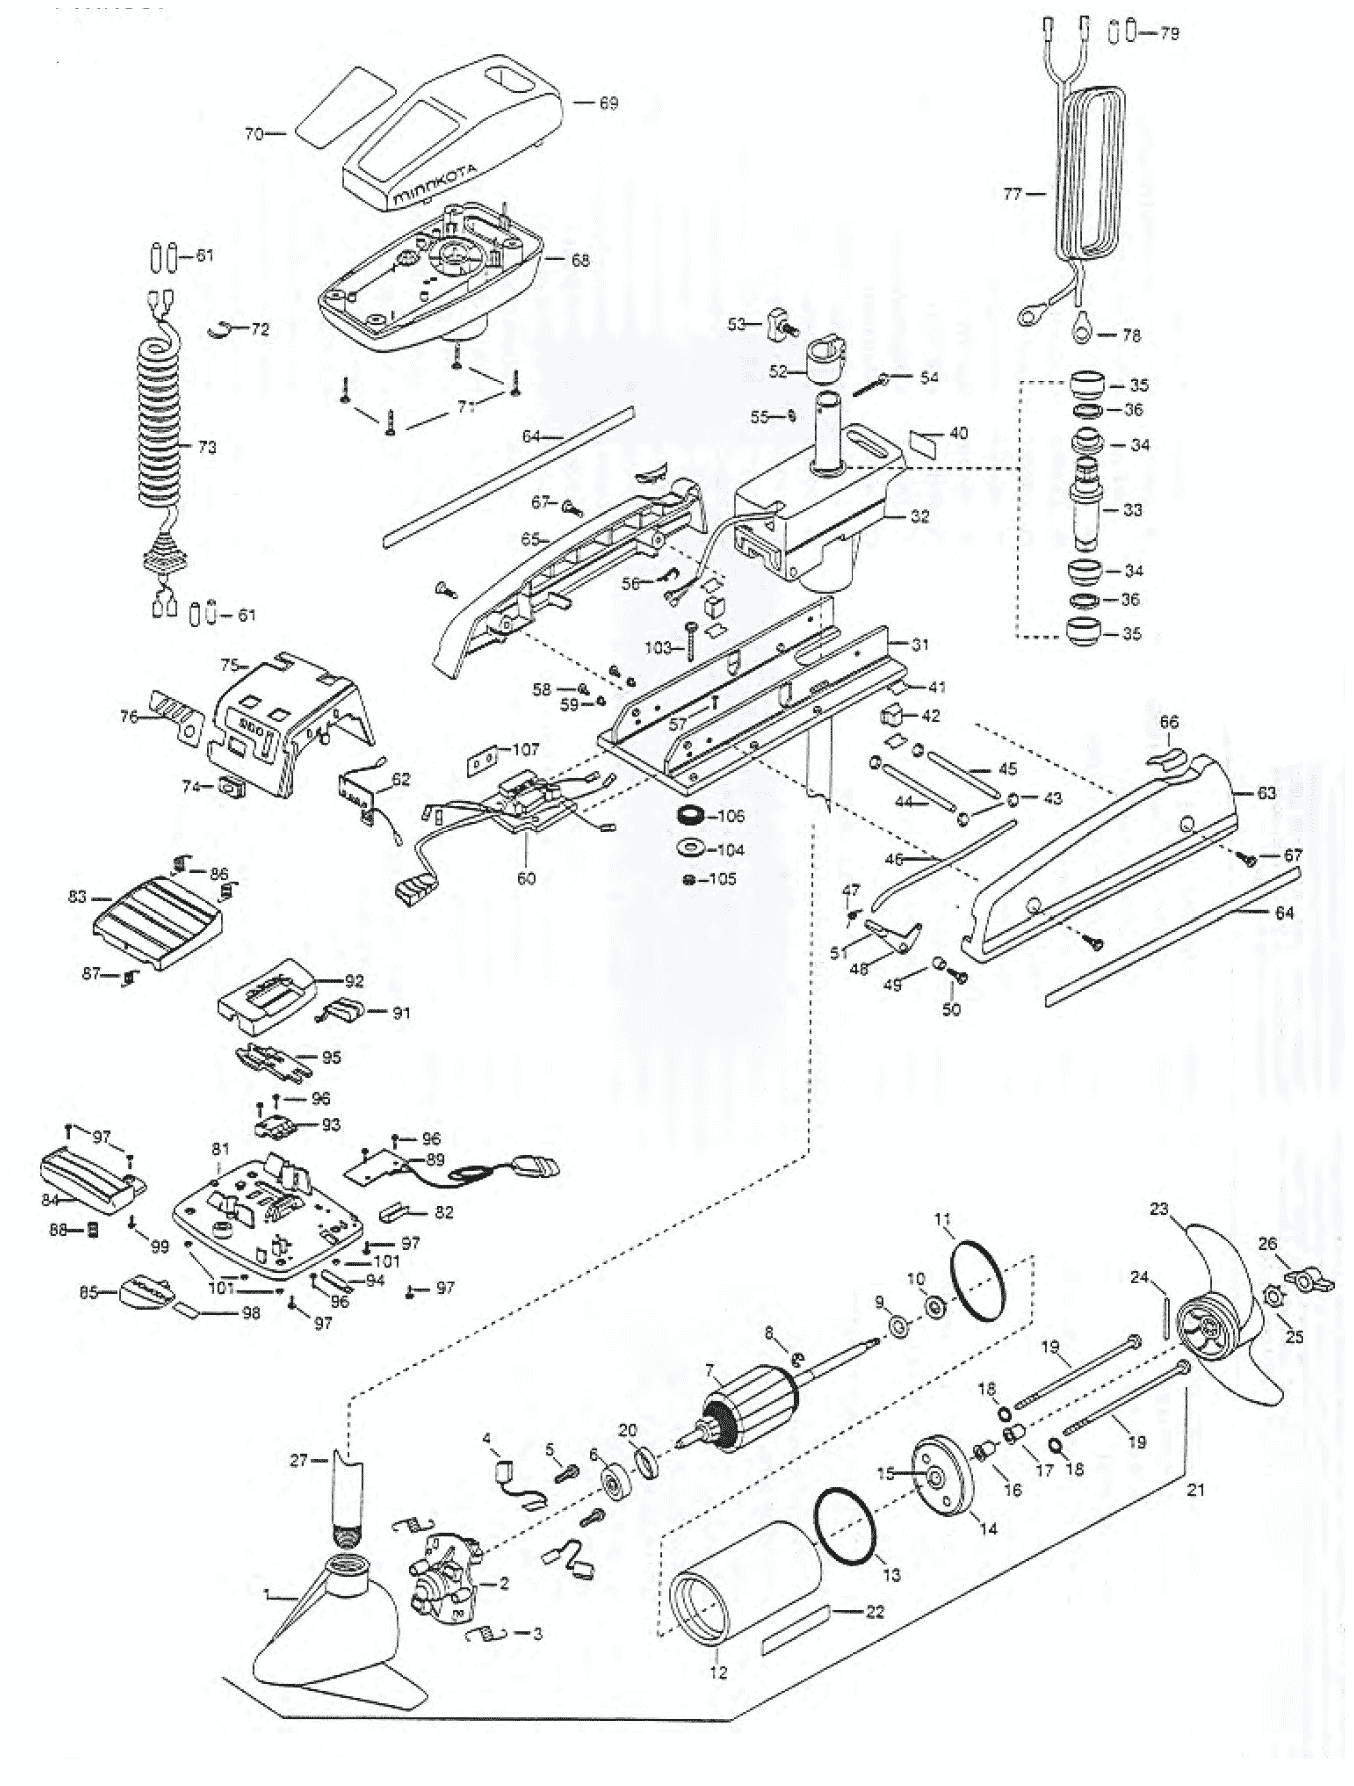 Minn Kota Powerdrive 52 Pro 54 Inch Parts